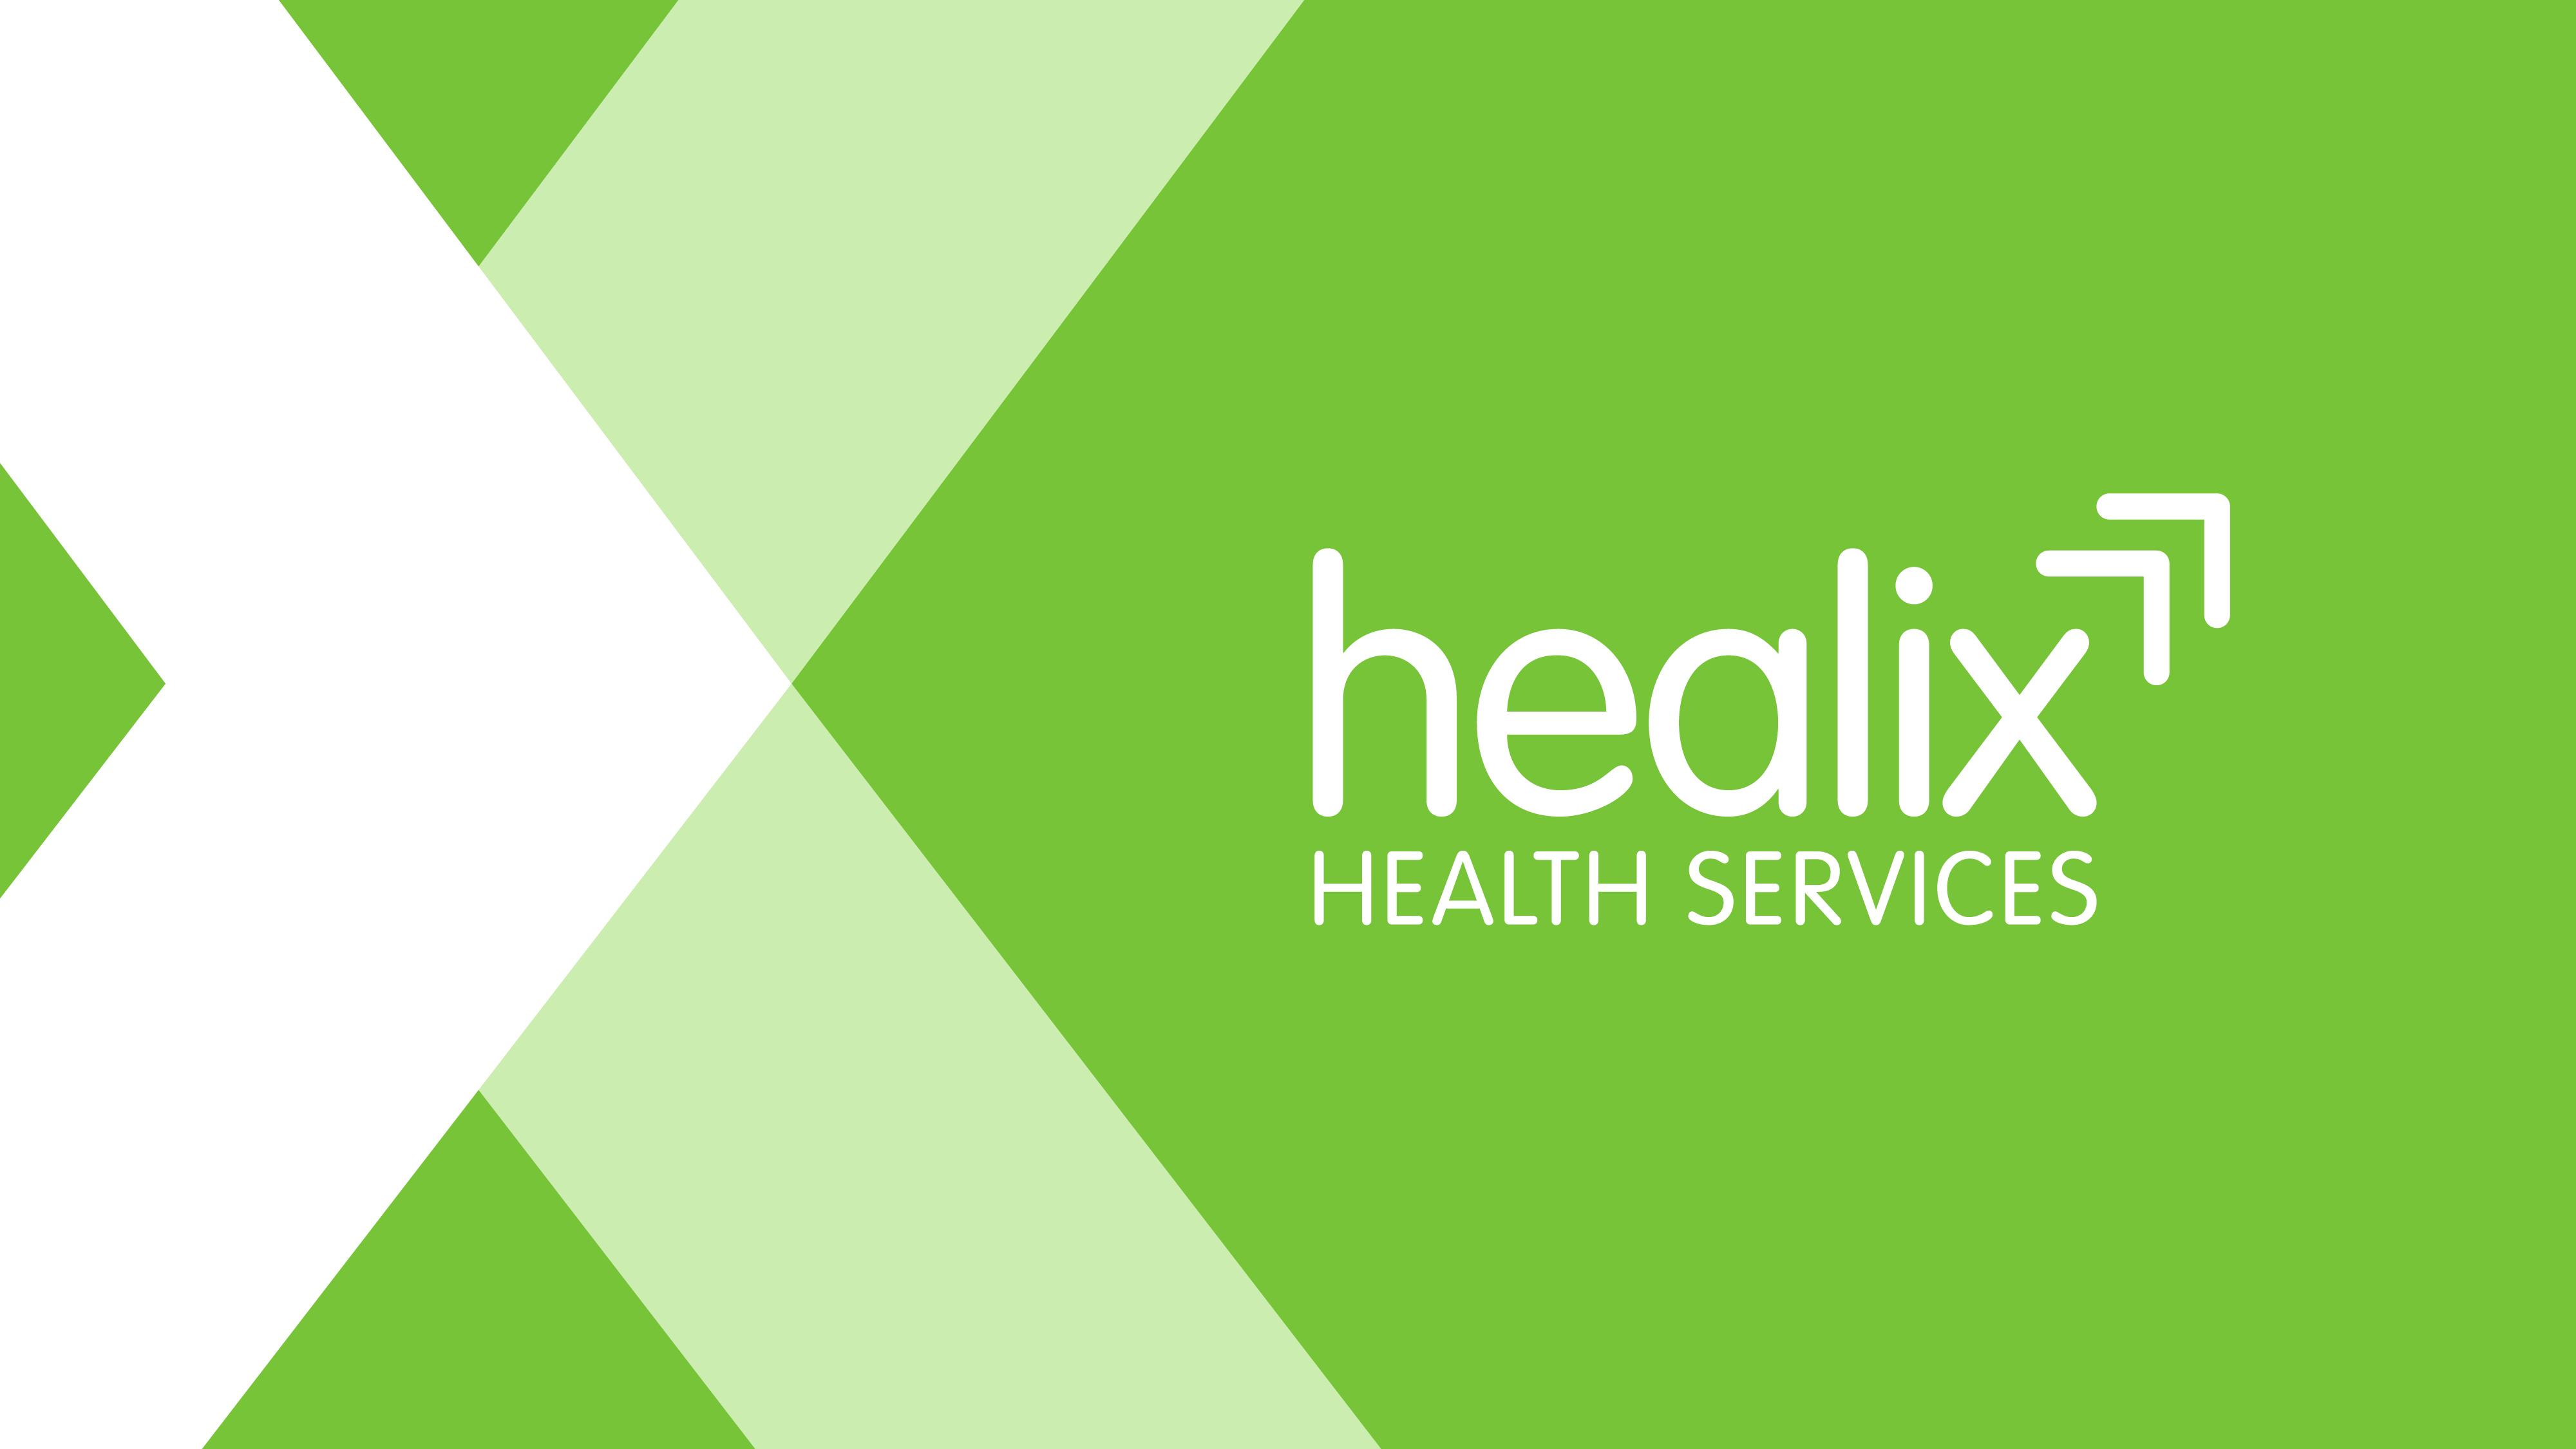 Healix_COVID19_Campaign_Animation_V3